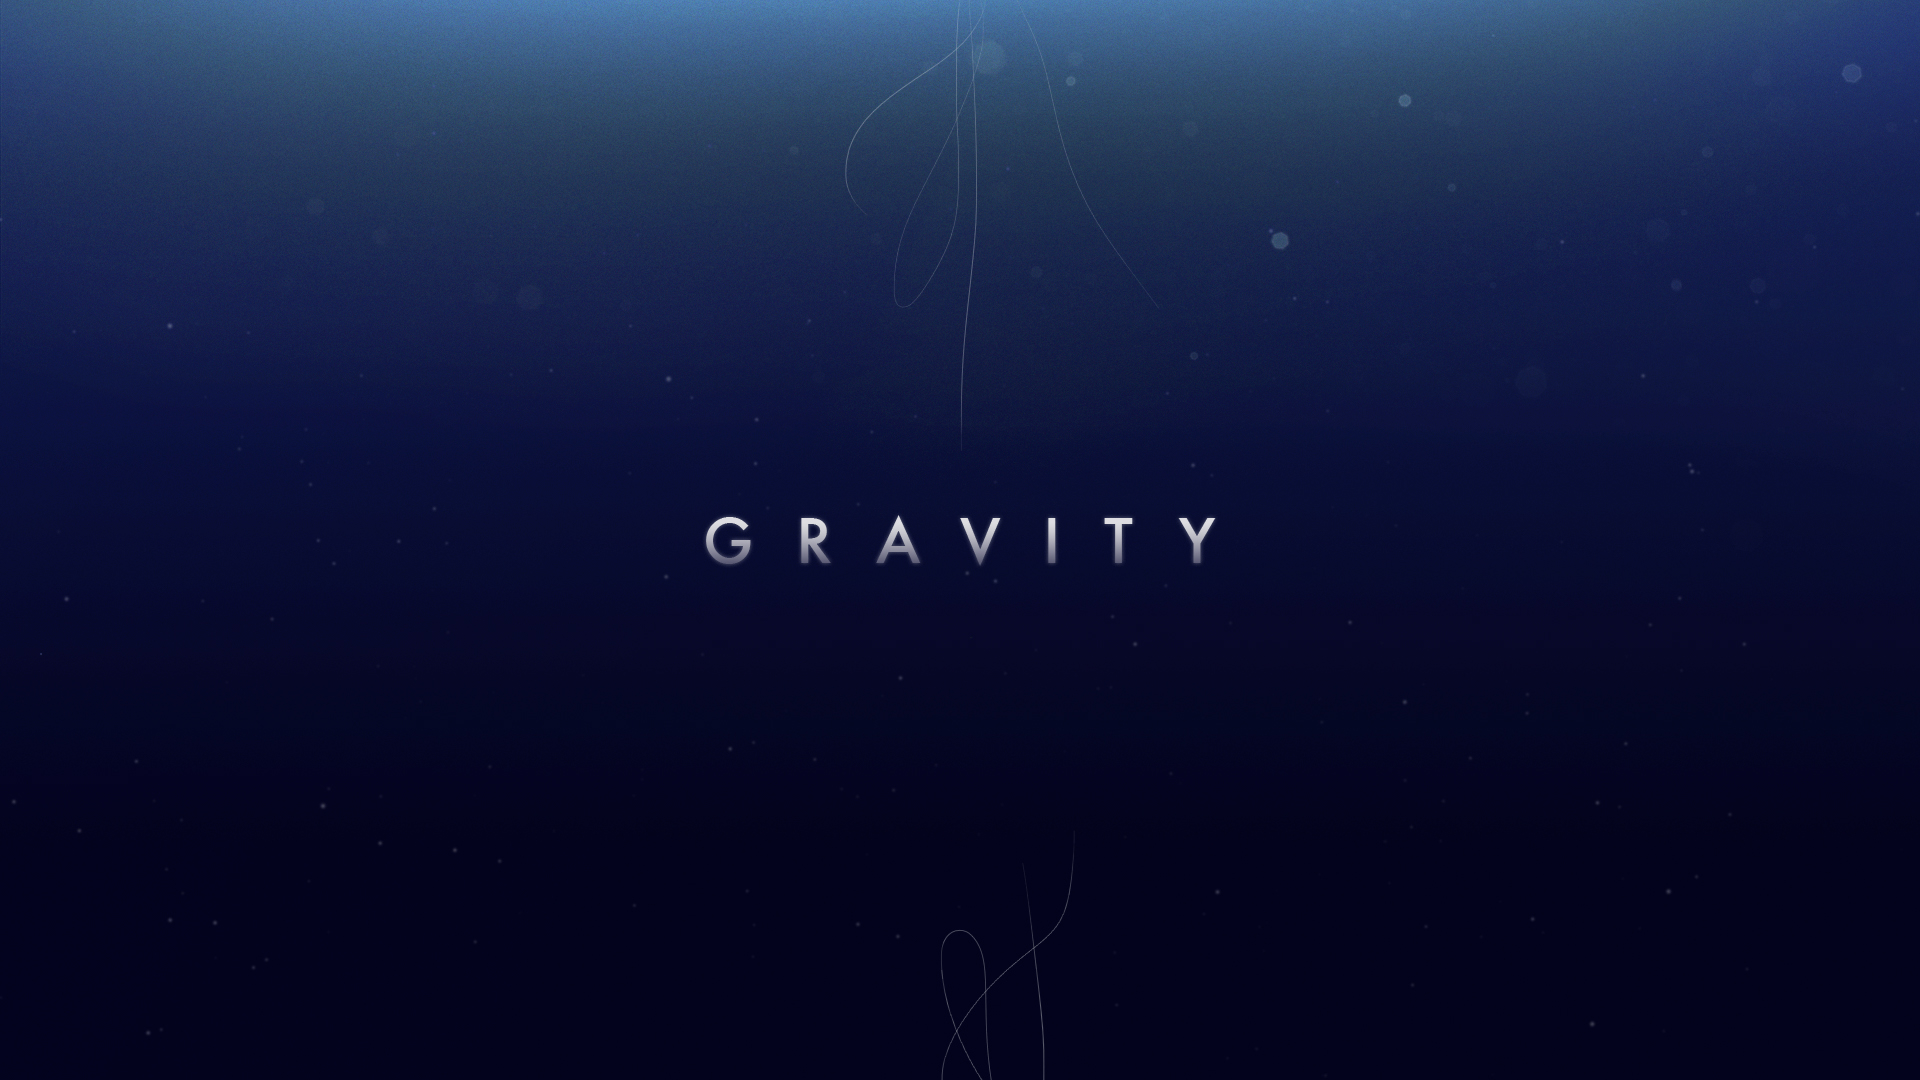 Gravity_frame04.jpeg